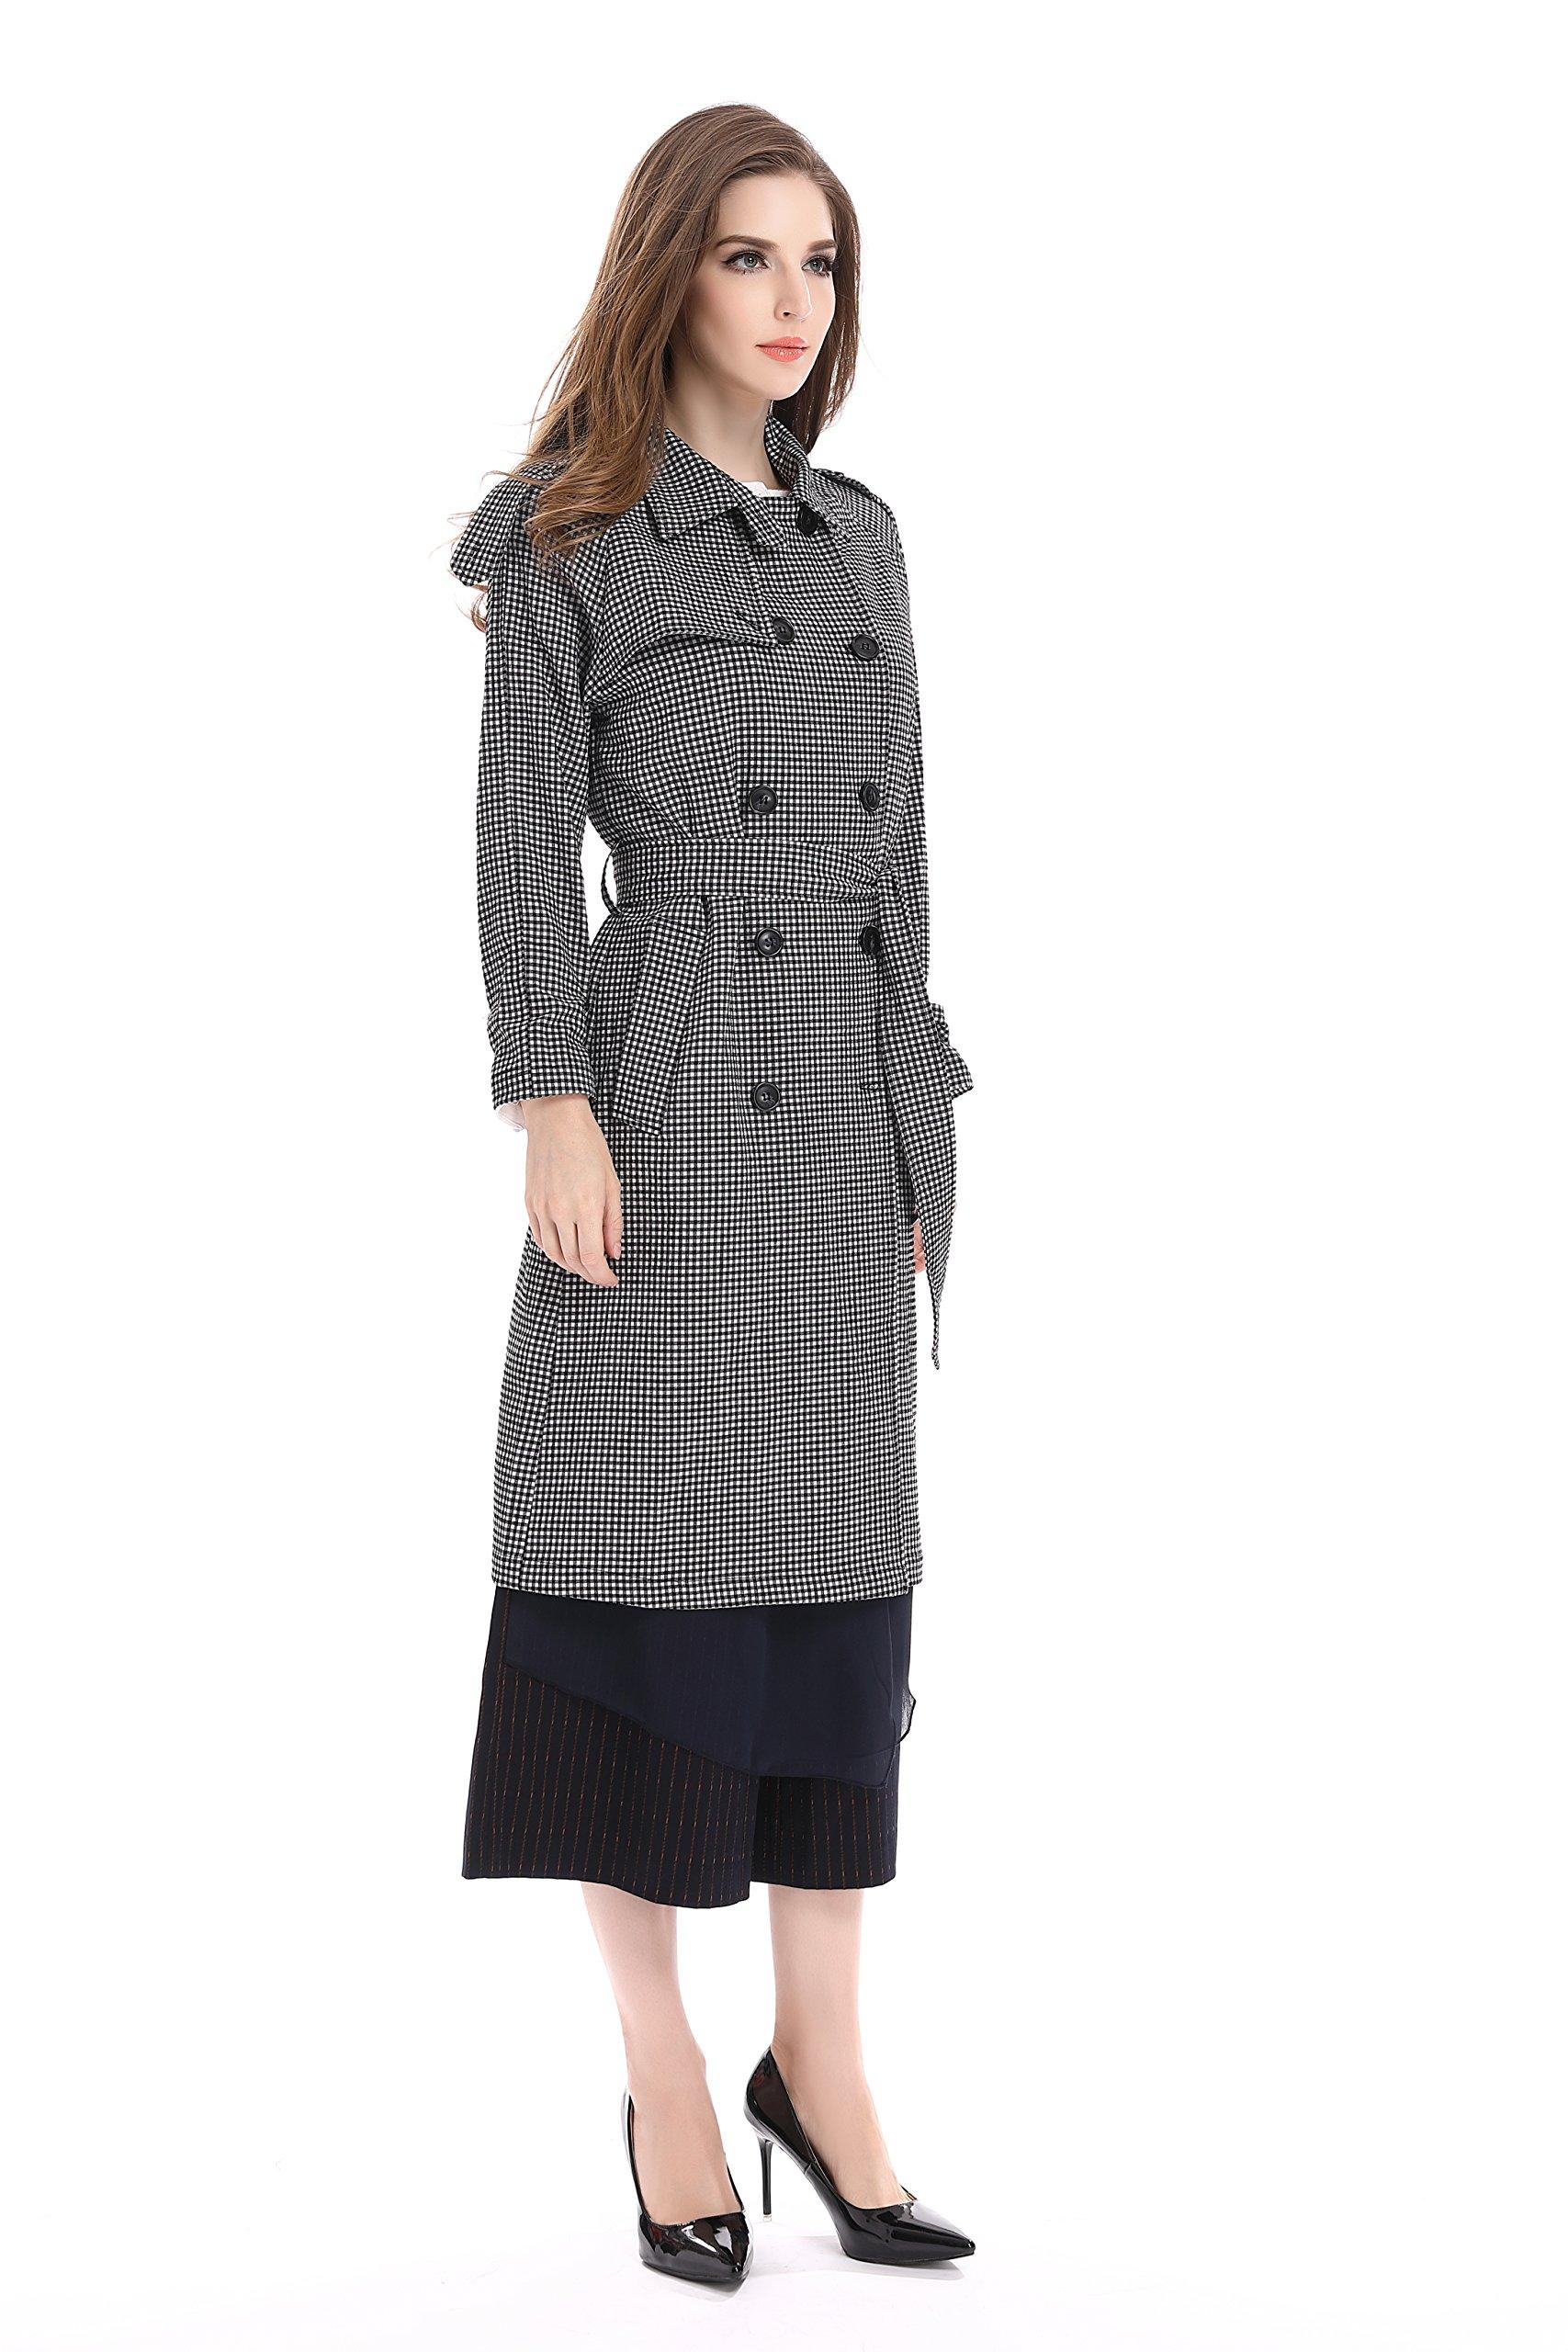 Bluemary Women's Fashion Fine Plaid Long Trench Coat With a Belt (medium, Greyish White) by Bluemary (Image #3)